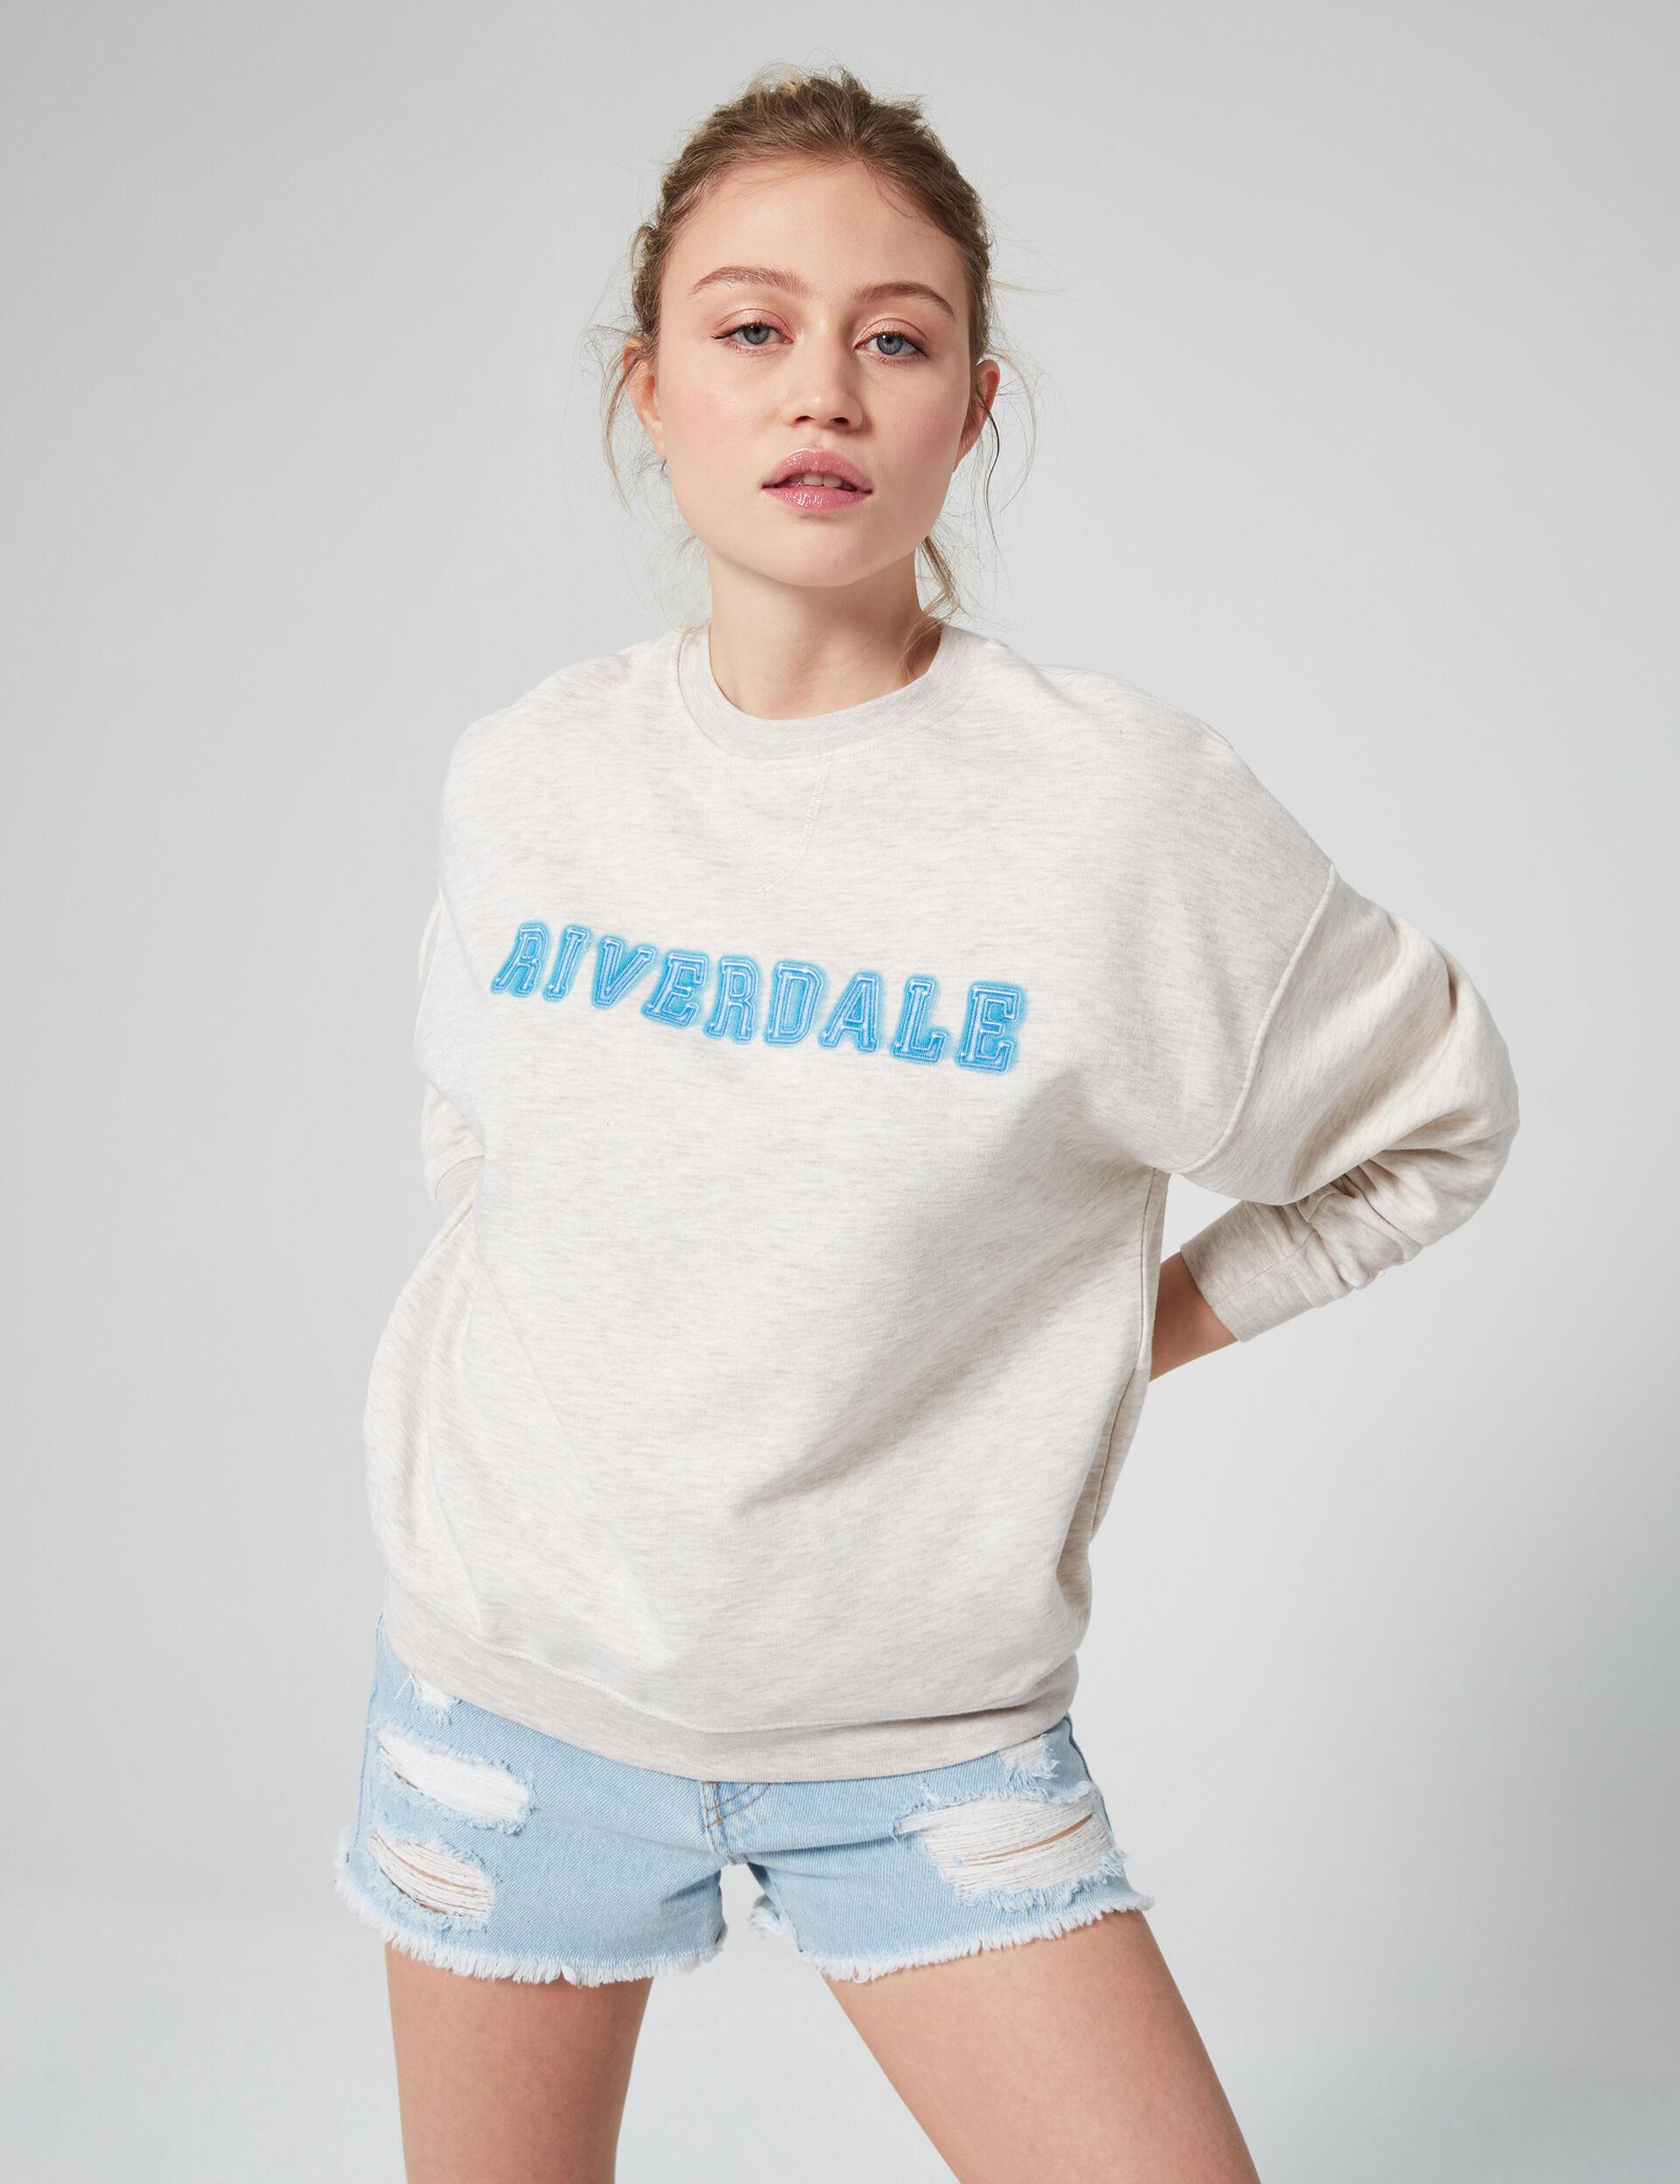 Riverdale sweatshirt